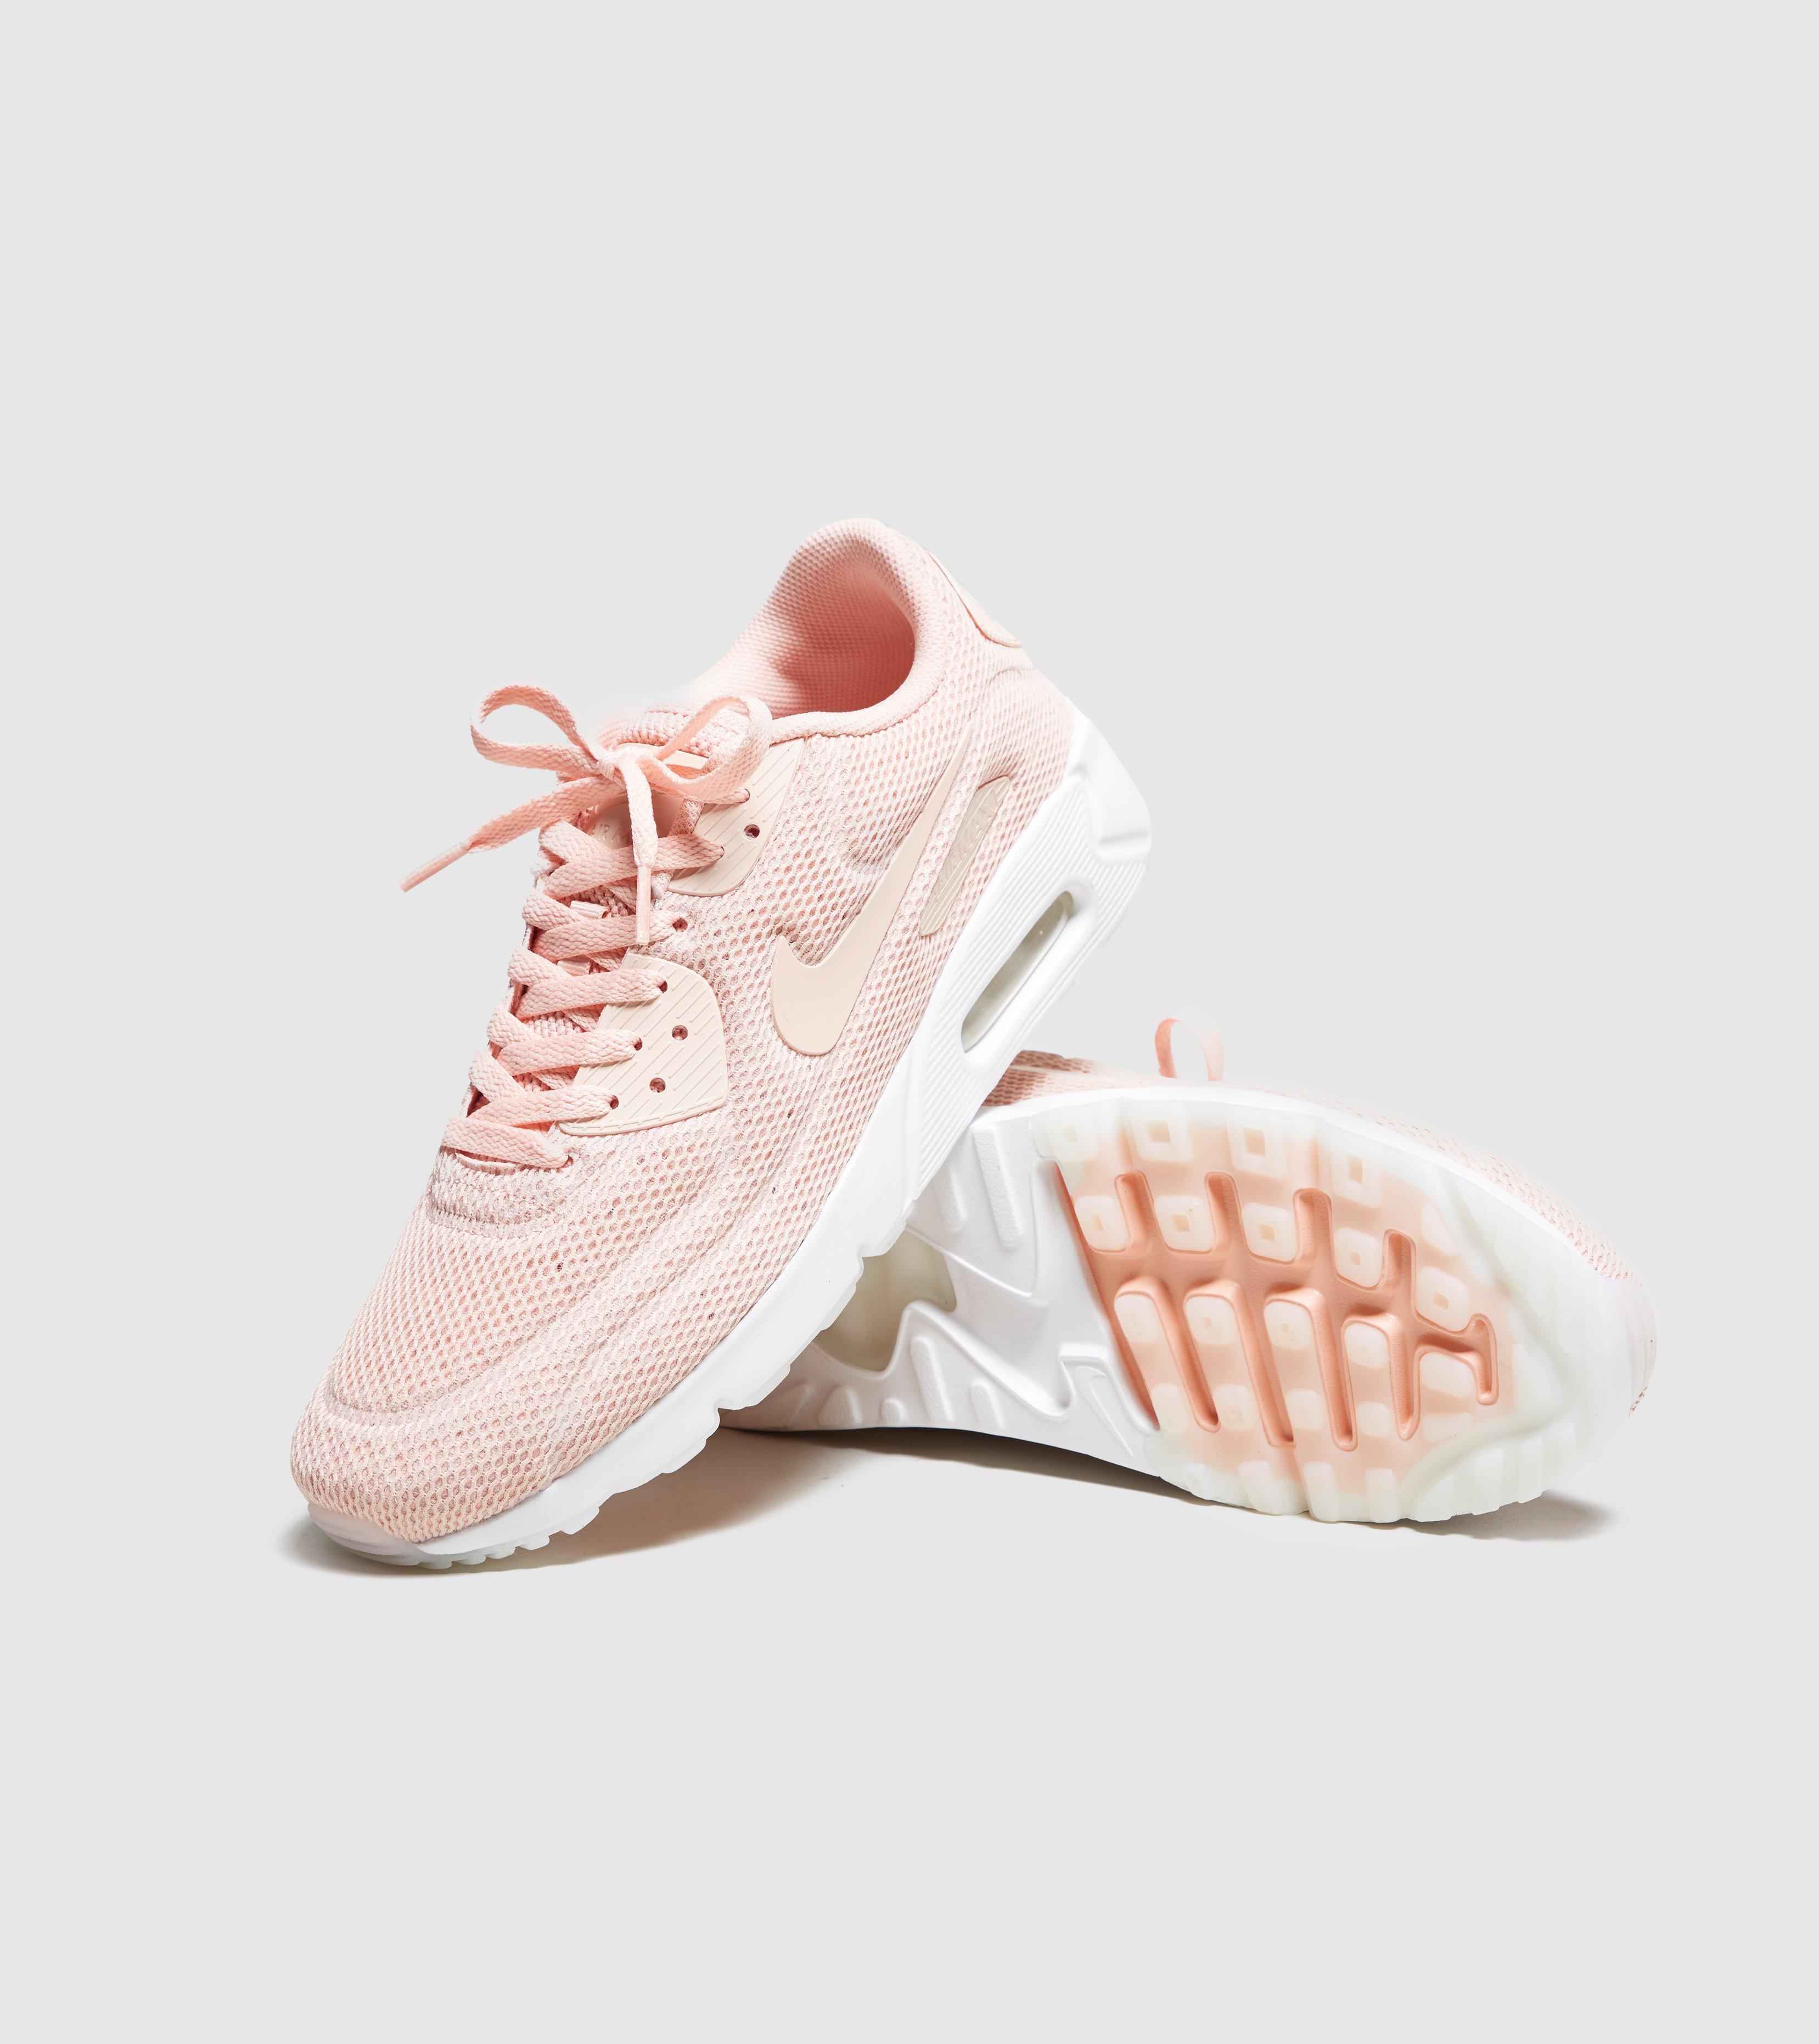 mejor liquidación Nike Air Max 90 De Ultra Respirar Rosa encontrar un gran ebay en línea QAeJIssDA